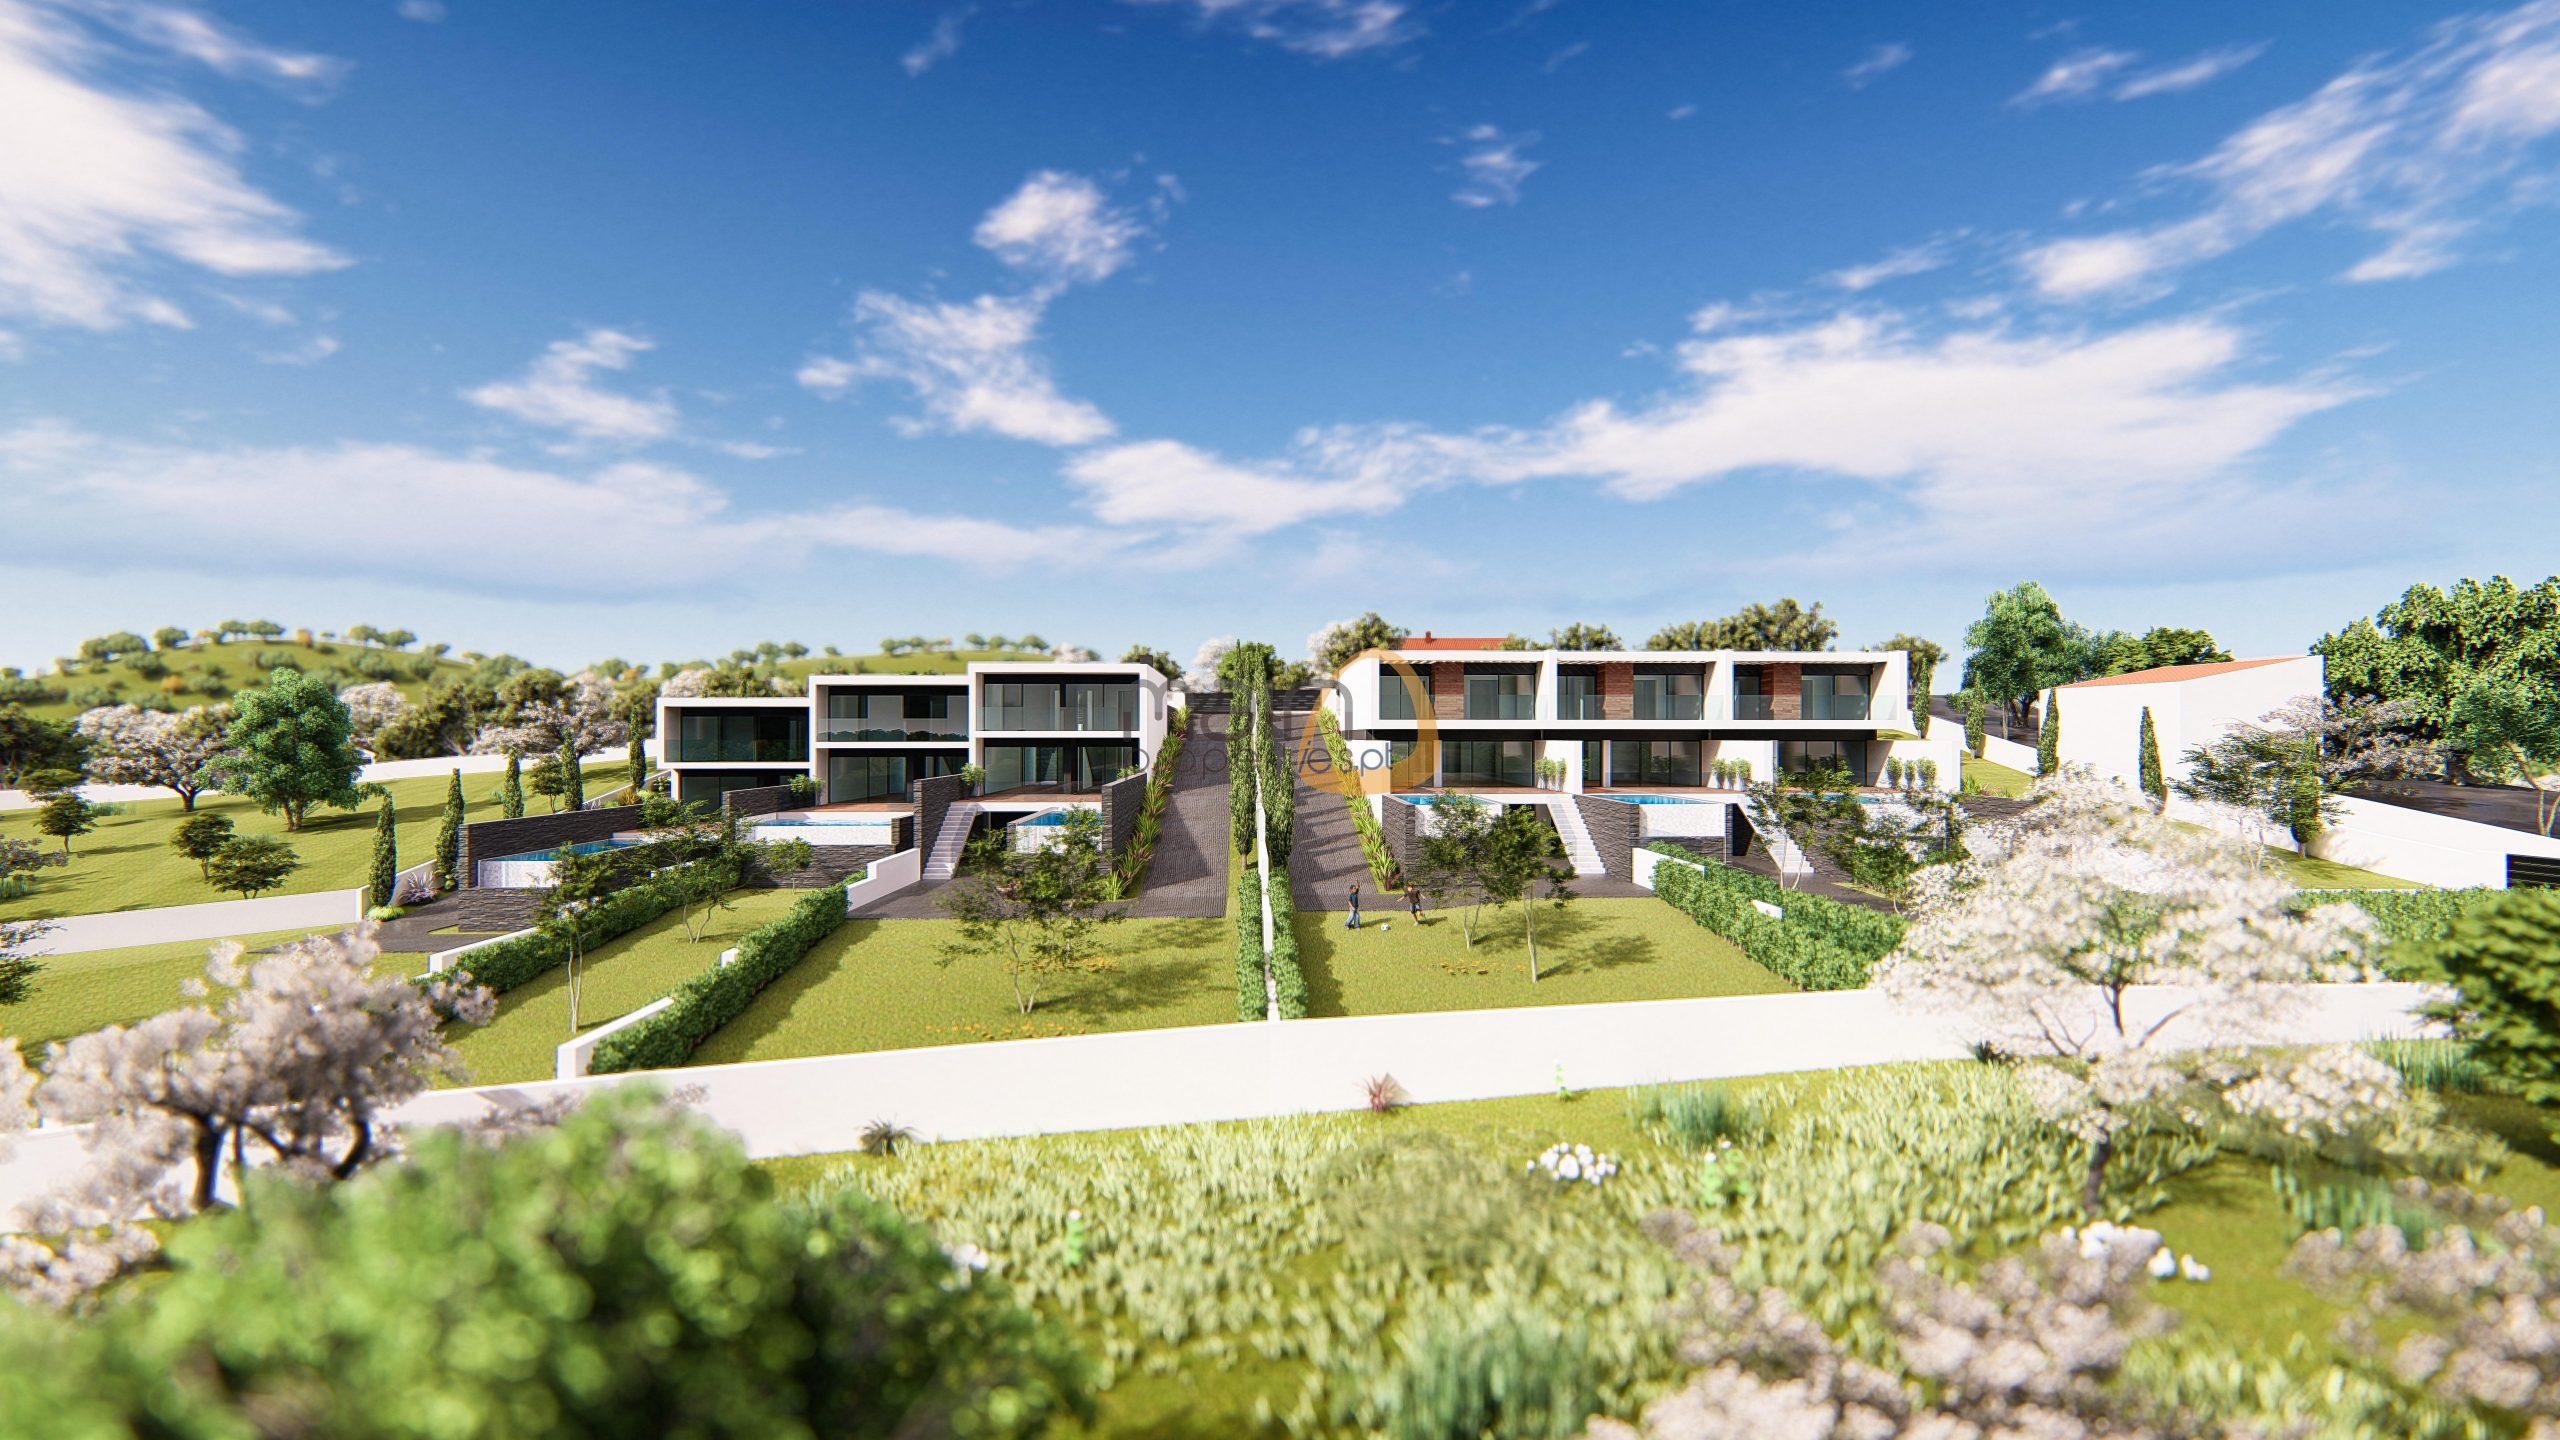 land-for-development-of-eleven-villas-with-sea-views-in-almancil-algarve-portugal-property-real-estate-06